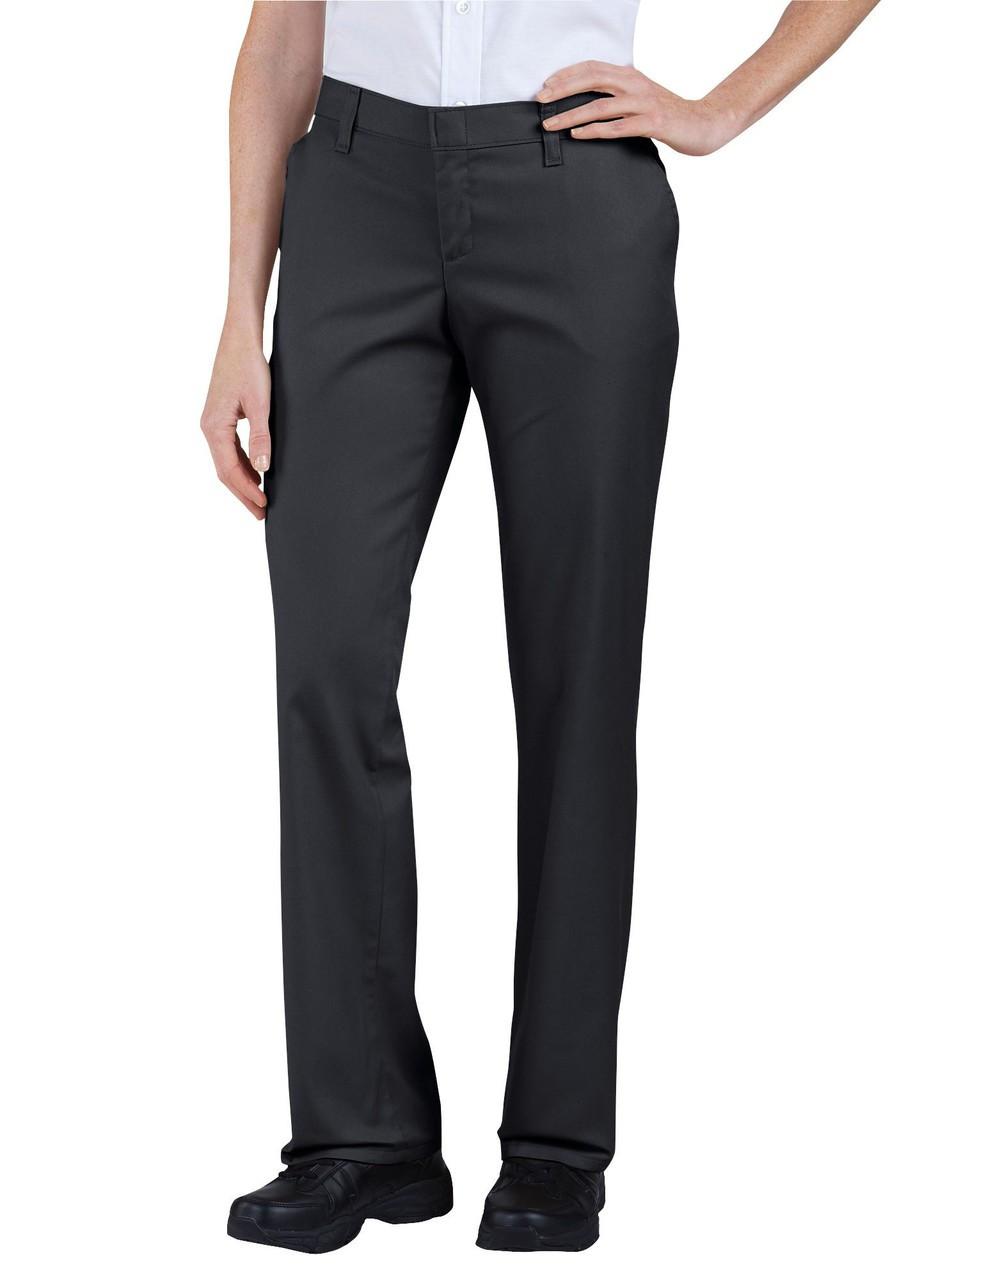 Dickies Fp221 Pantalones De Mujer Tipo Dockers Poliester Algodon Bodega De Uniformes Dickies Cherokee Grey S Anatomy